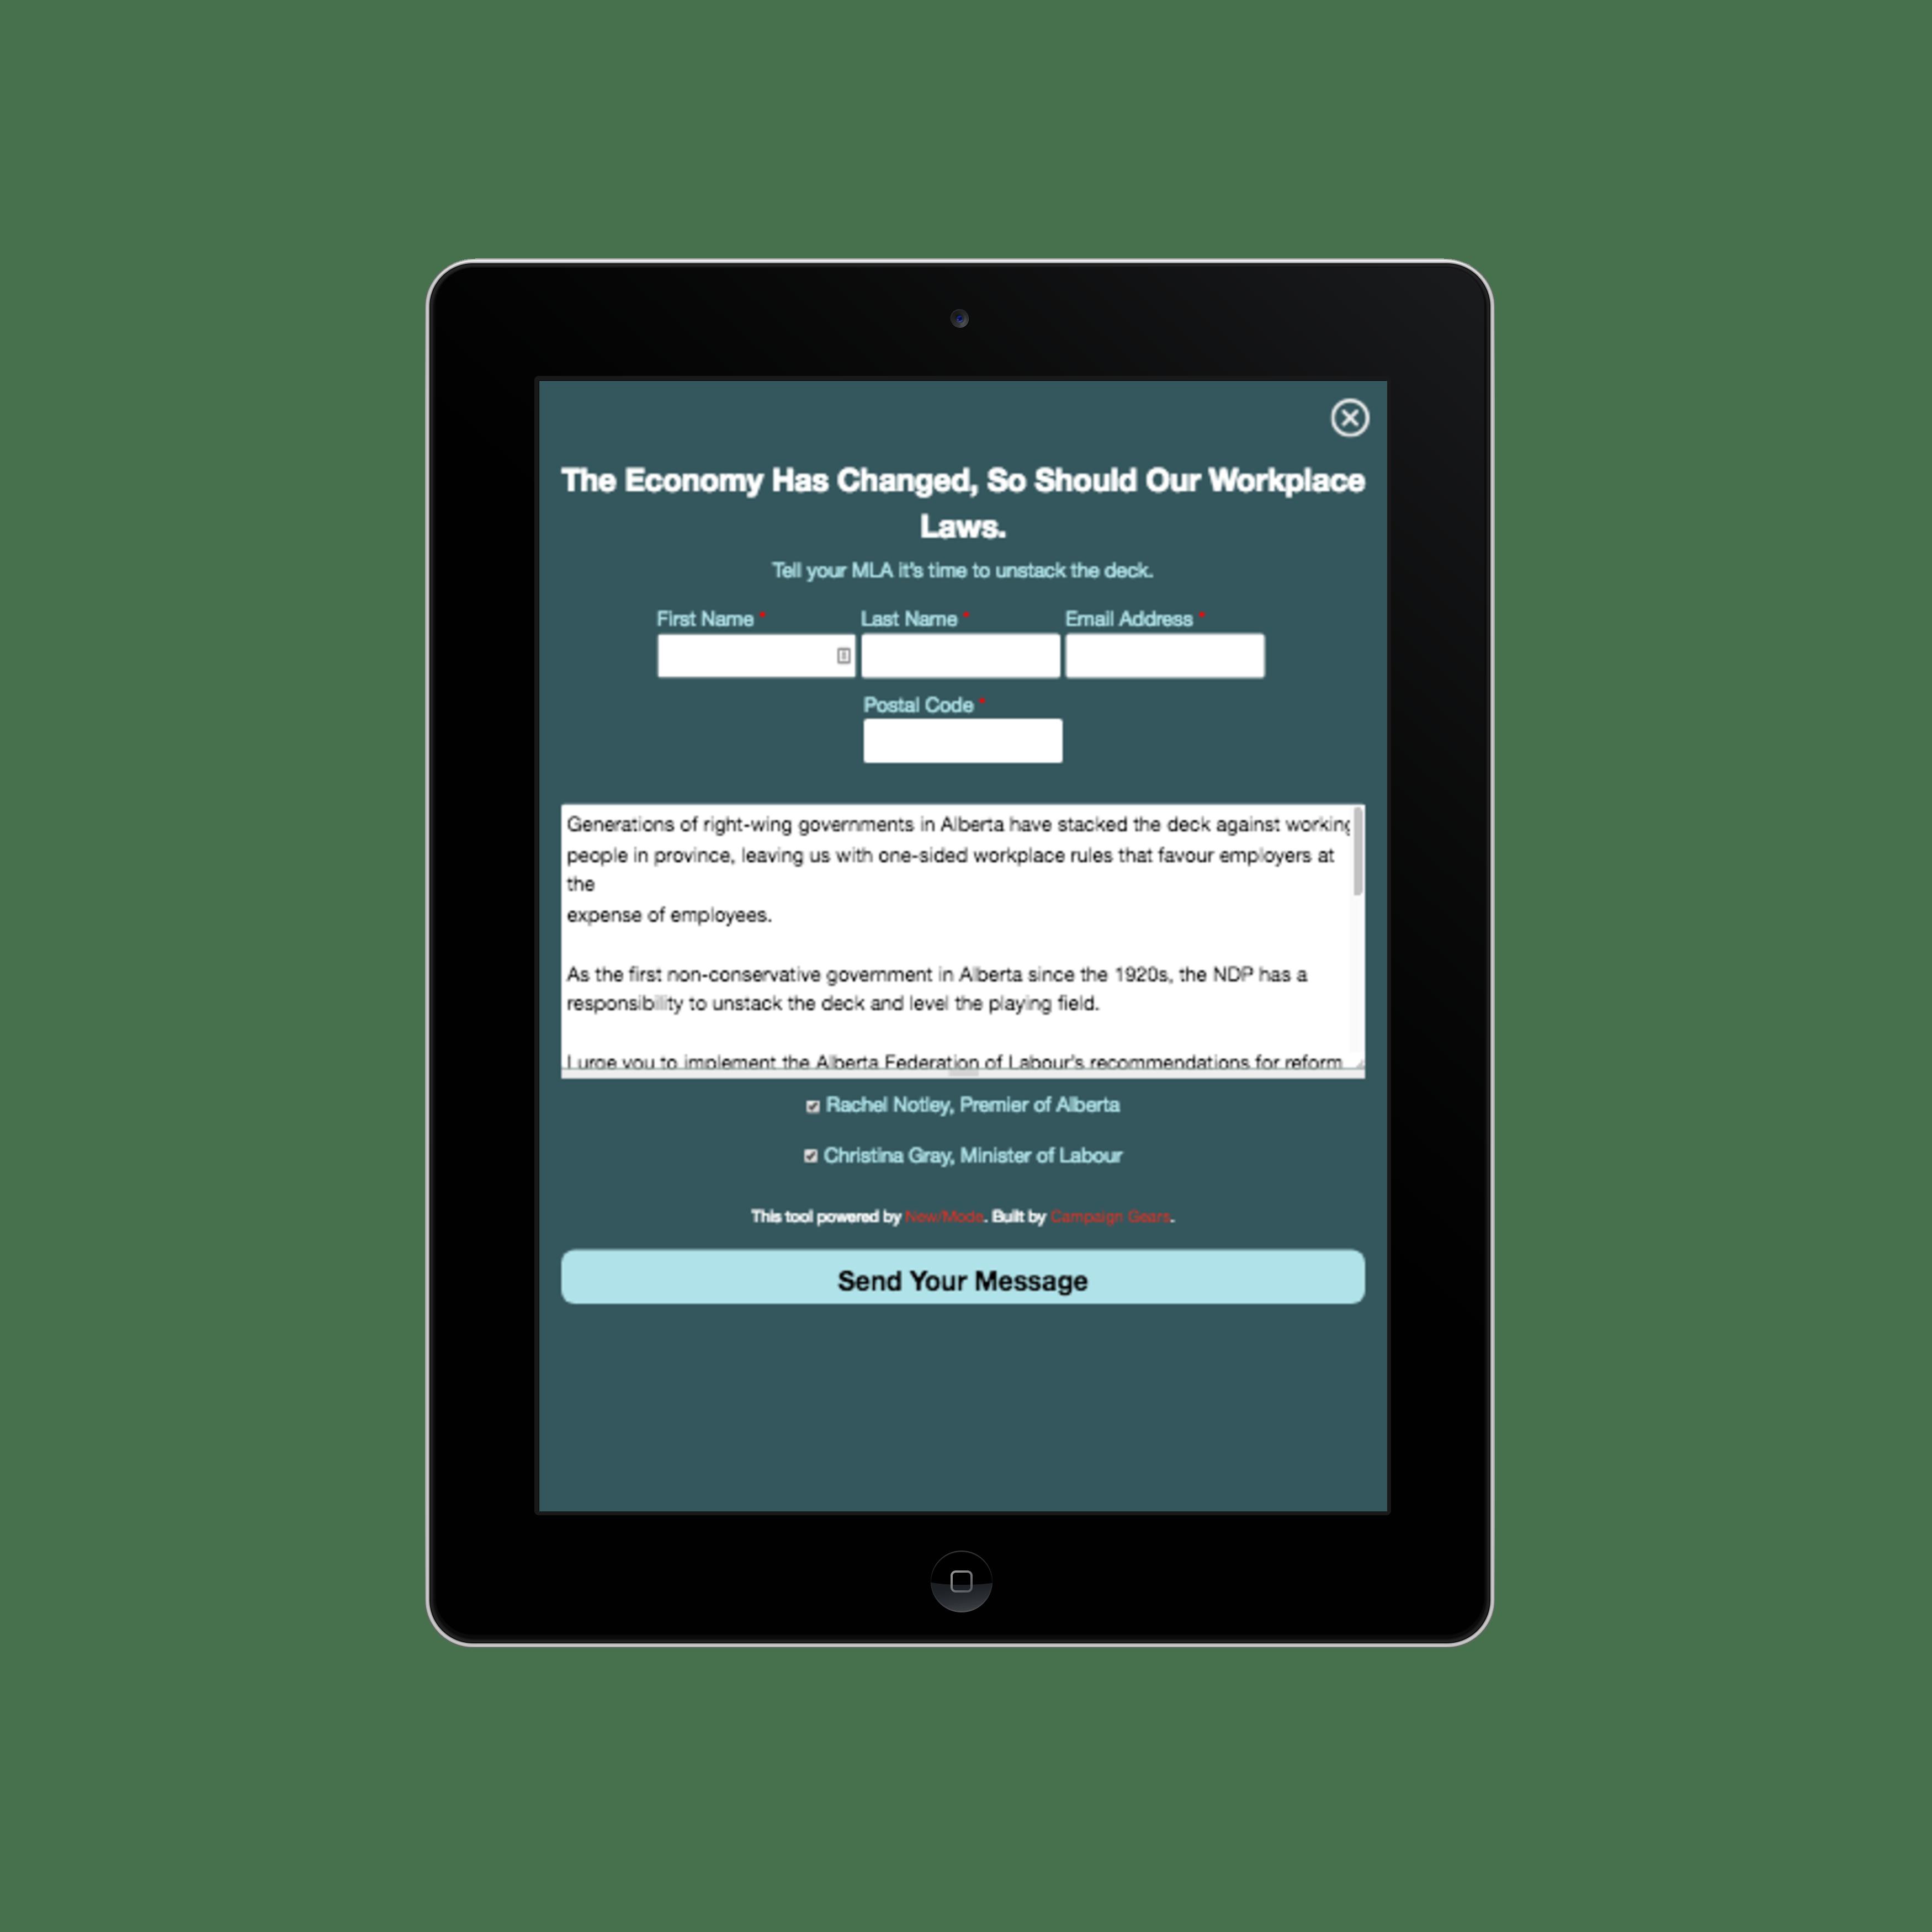 unstackthedeck.ca-(iPad) (2)_ipad_black_portrait.png